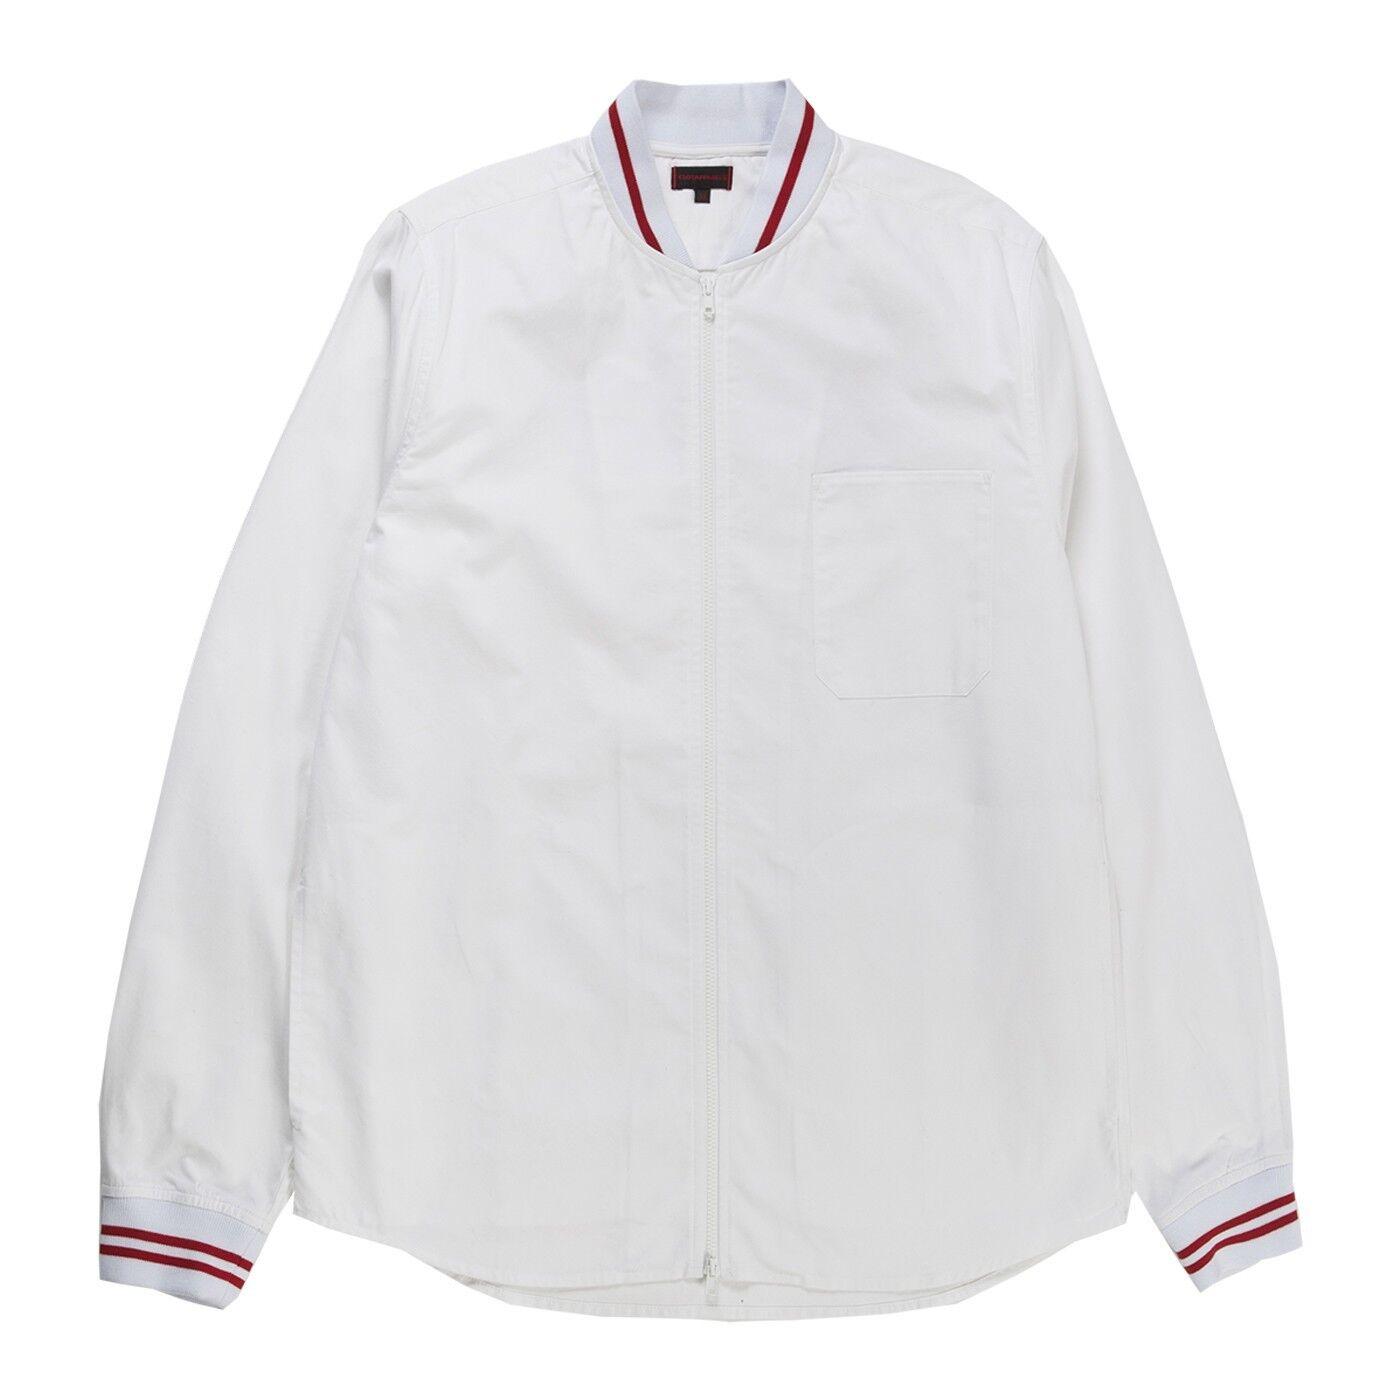 CLOT Men Ribbed Zip Up Shirt Weiß